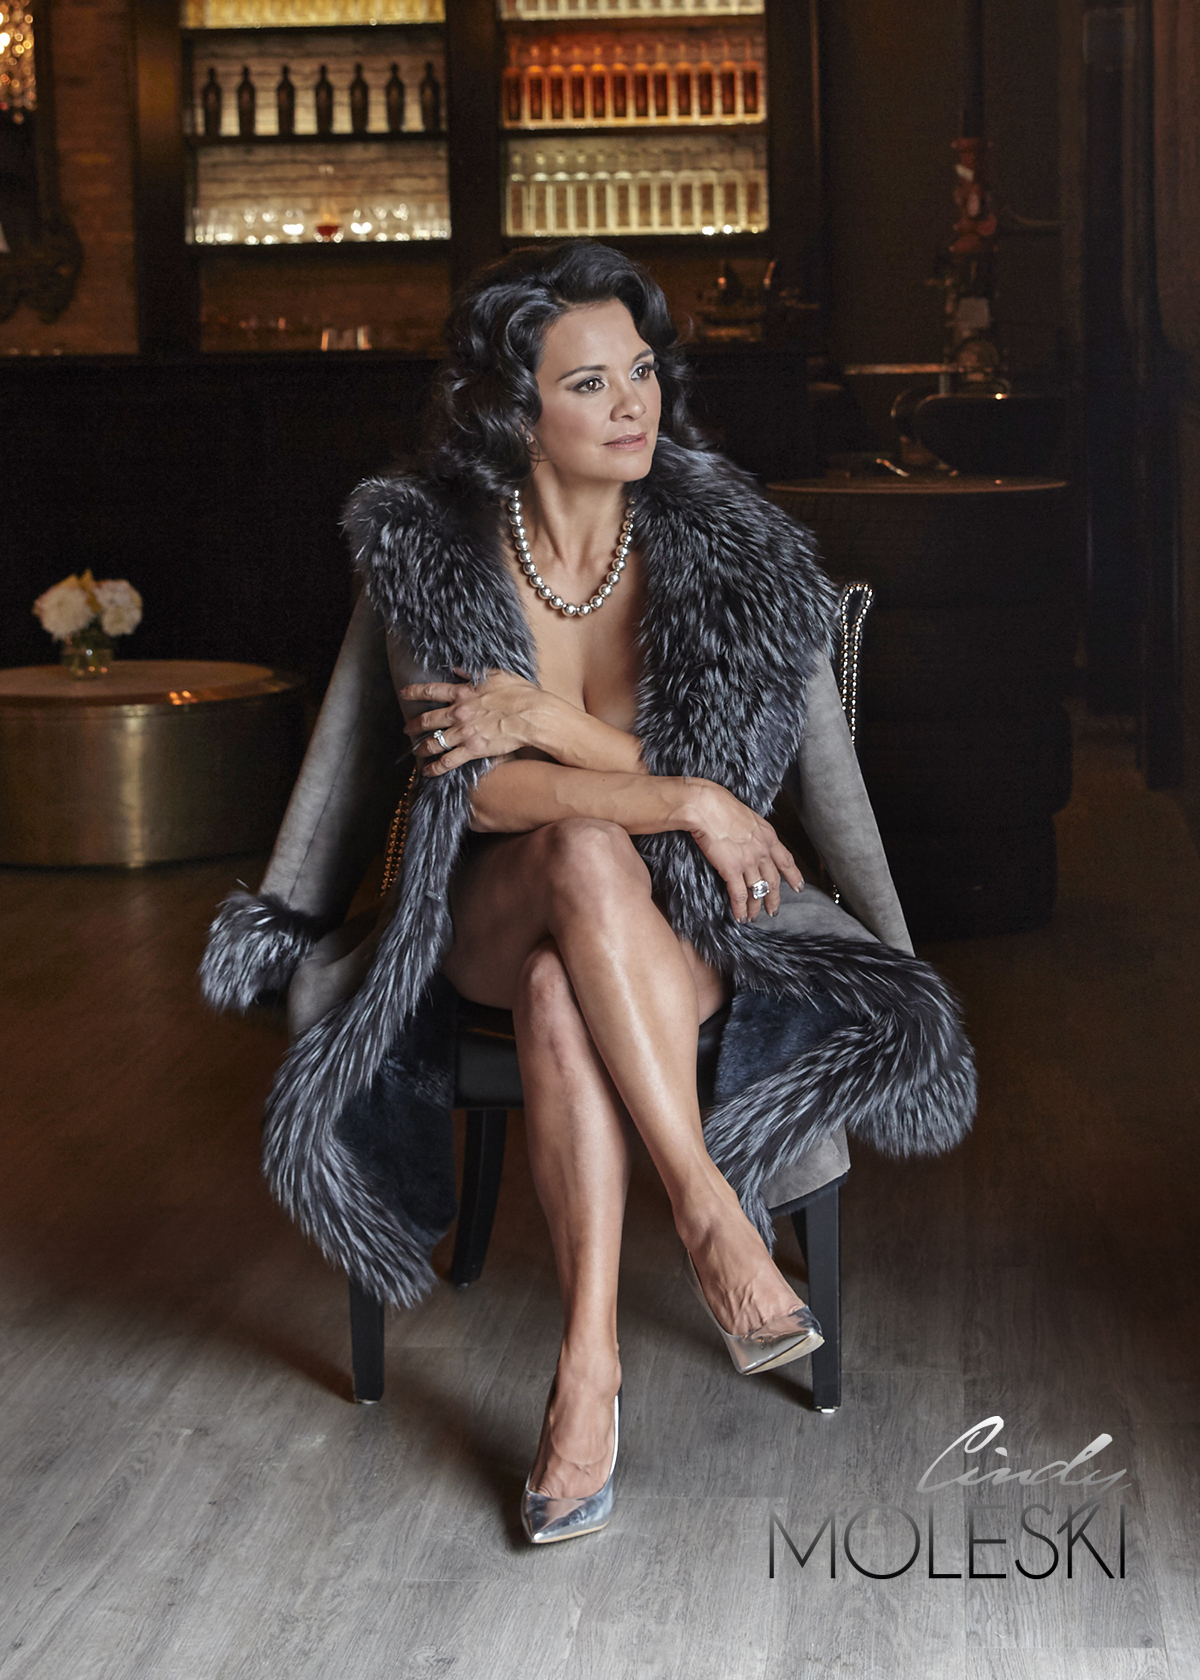 cindy-moleski-professional-boudoir-photography-saskatoon-saskatchewan-instagram -pinterest - 28983-2573e.jpg